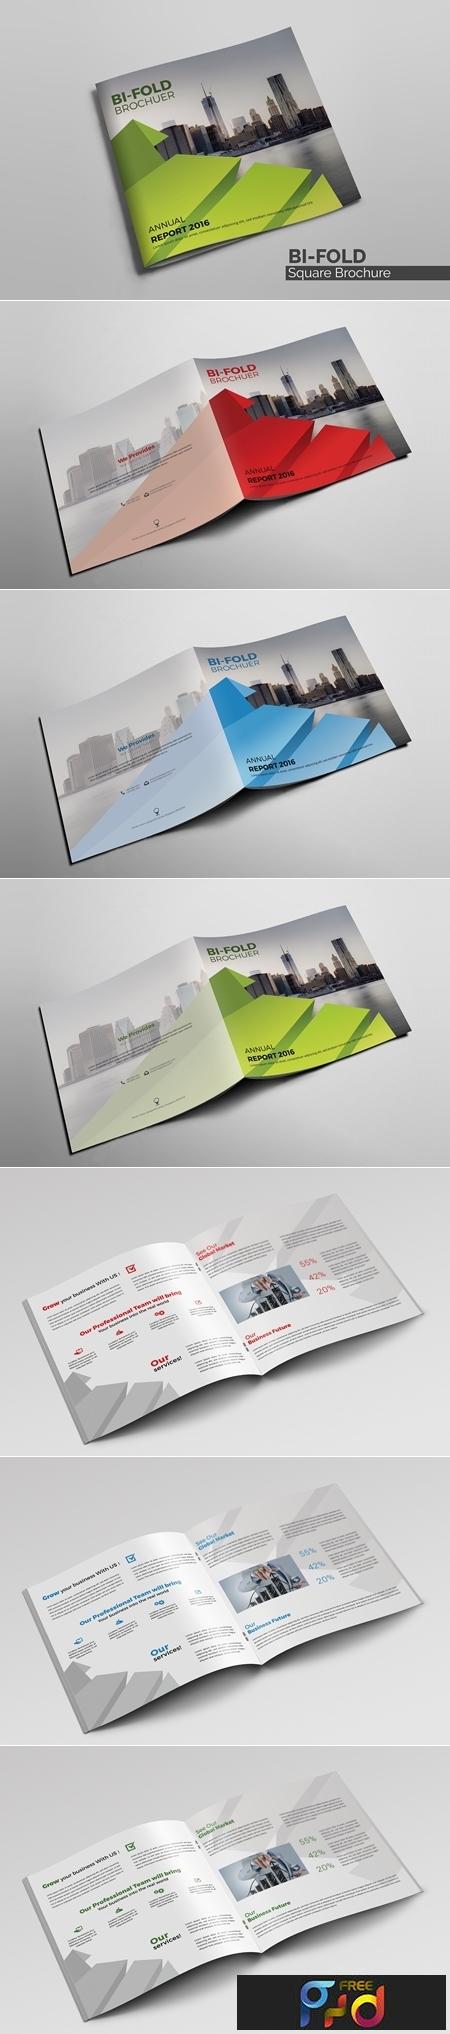 Bi-fold Brochure 3502612 1